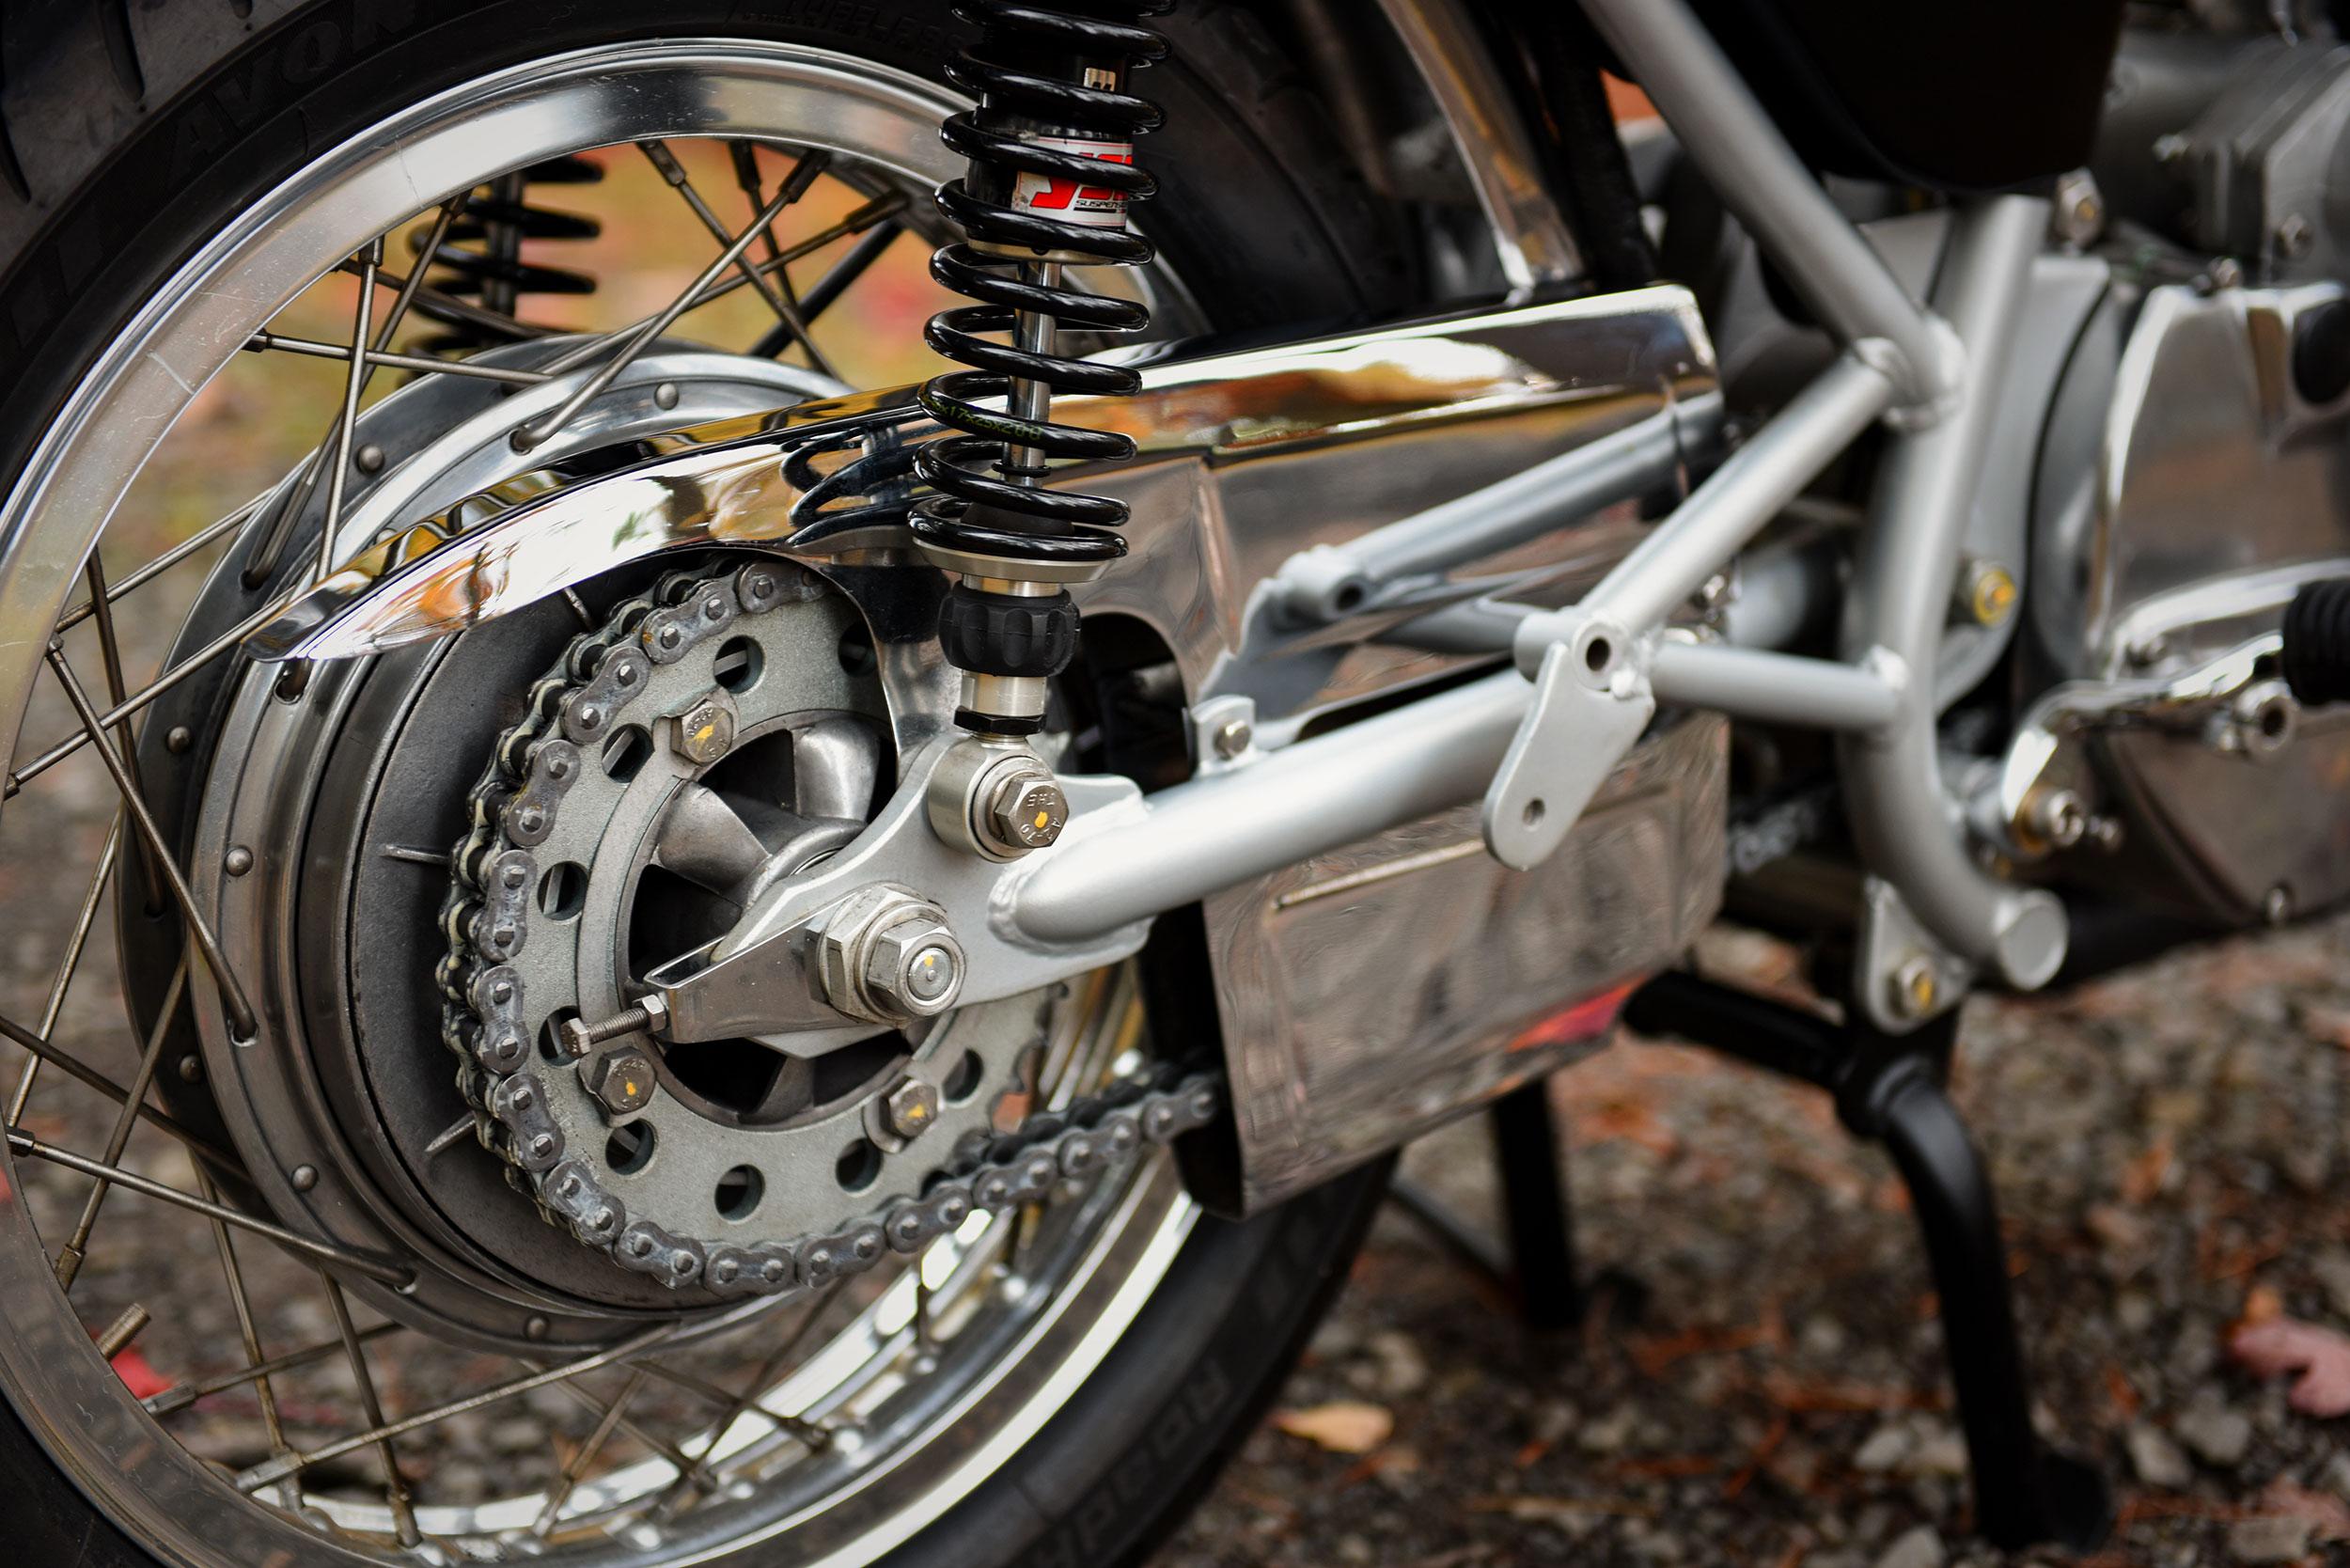 Laverda SFC 2 Custom Motorcycle Moto Borgotaro Chain